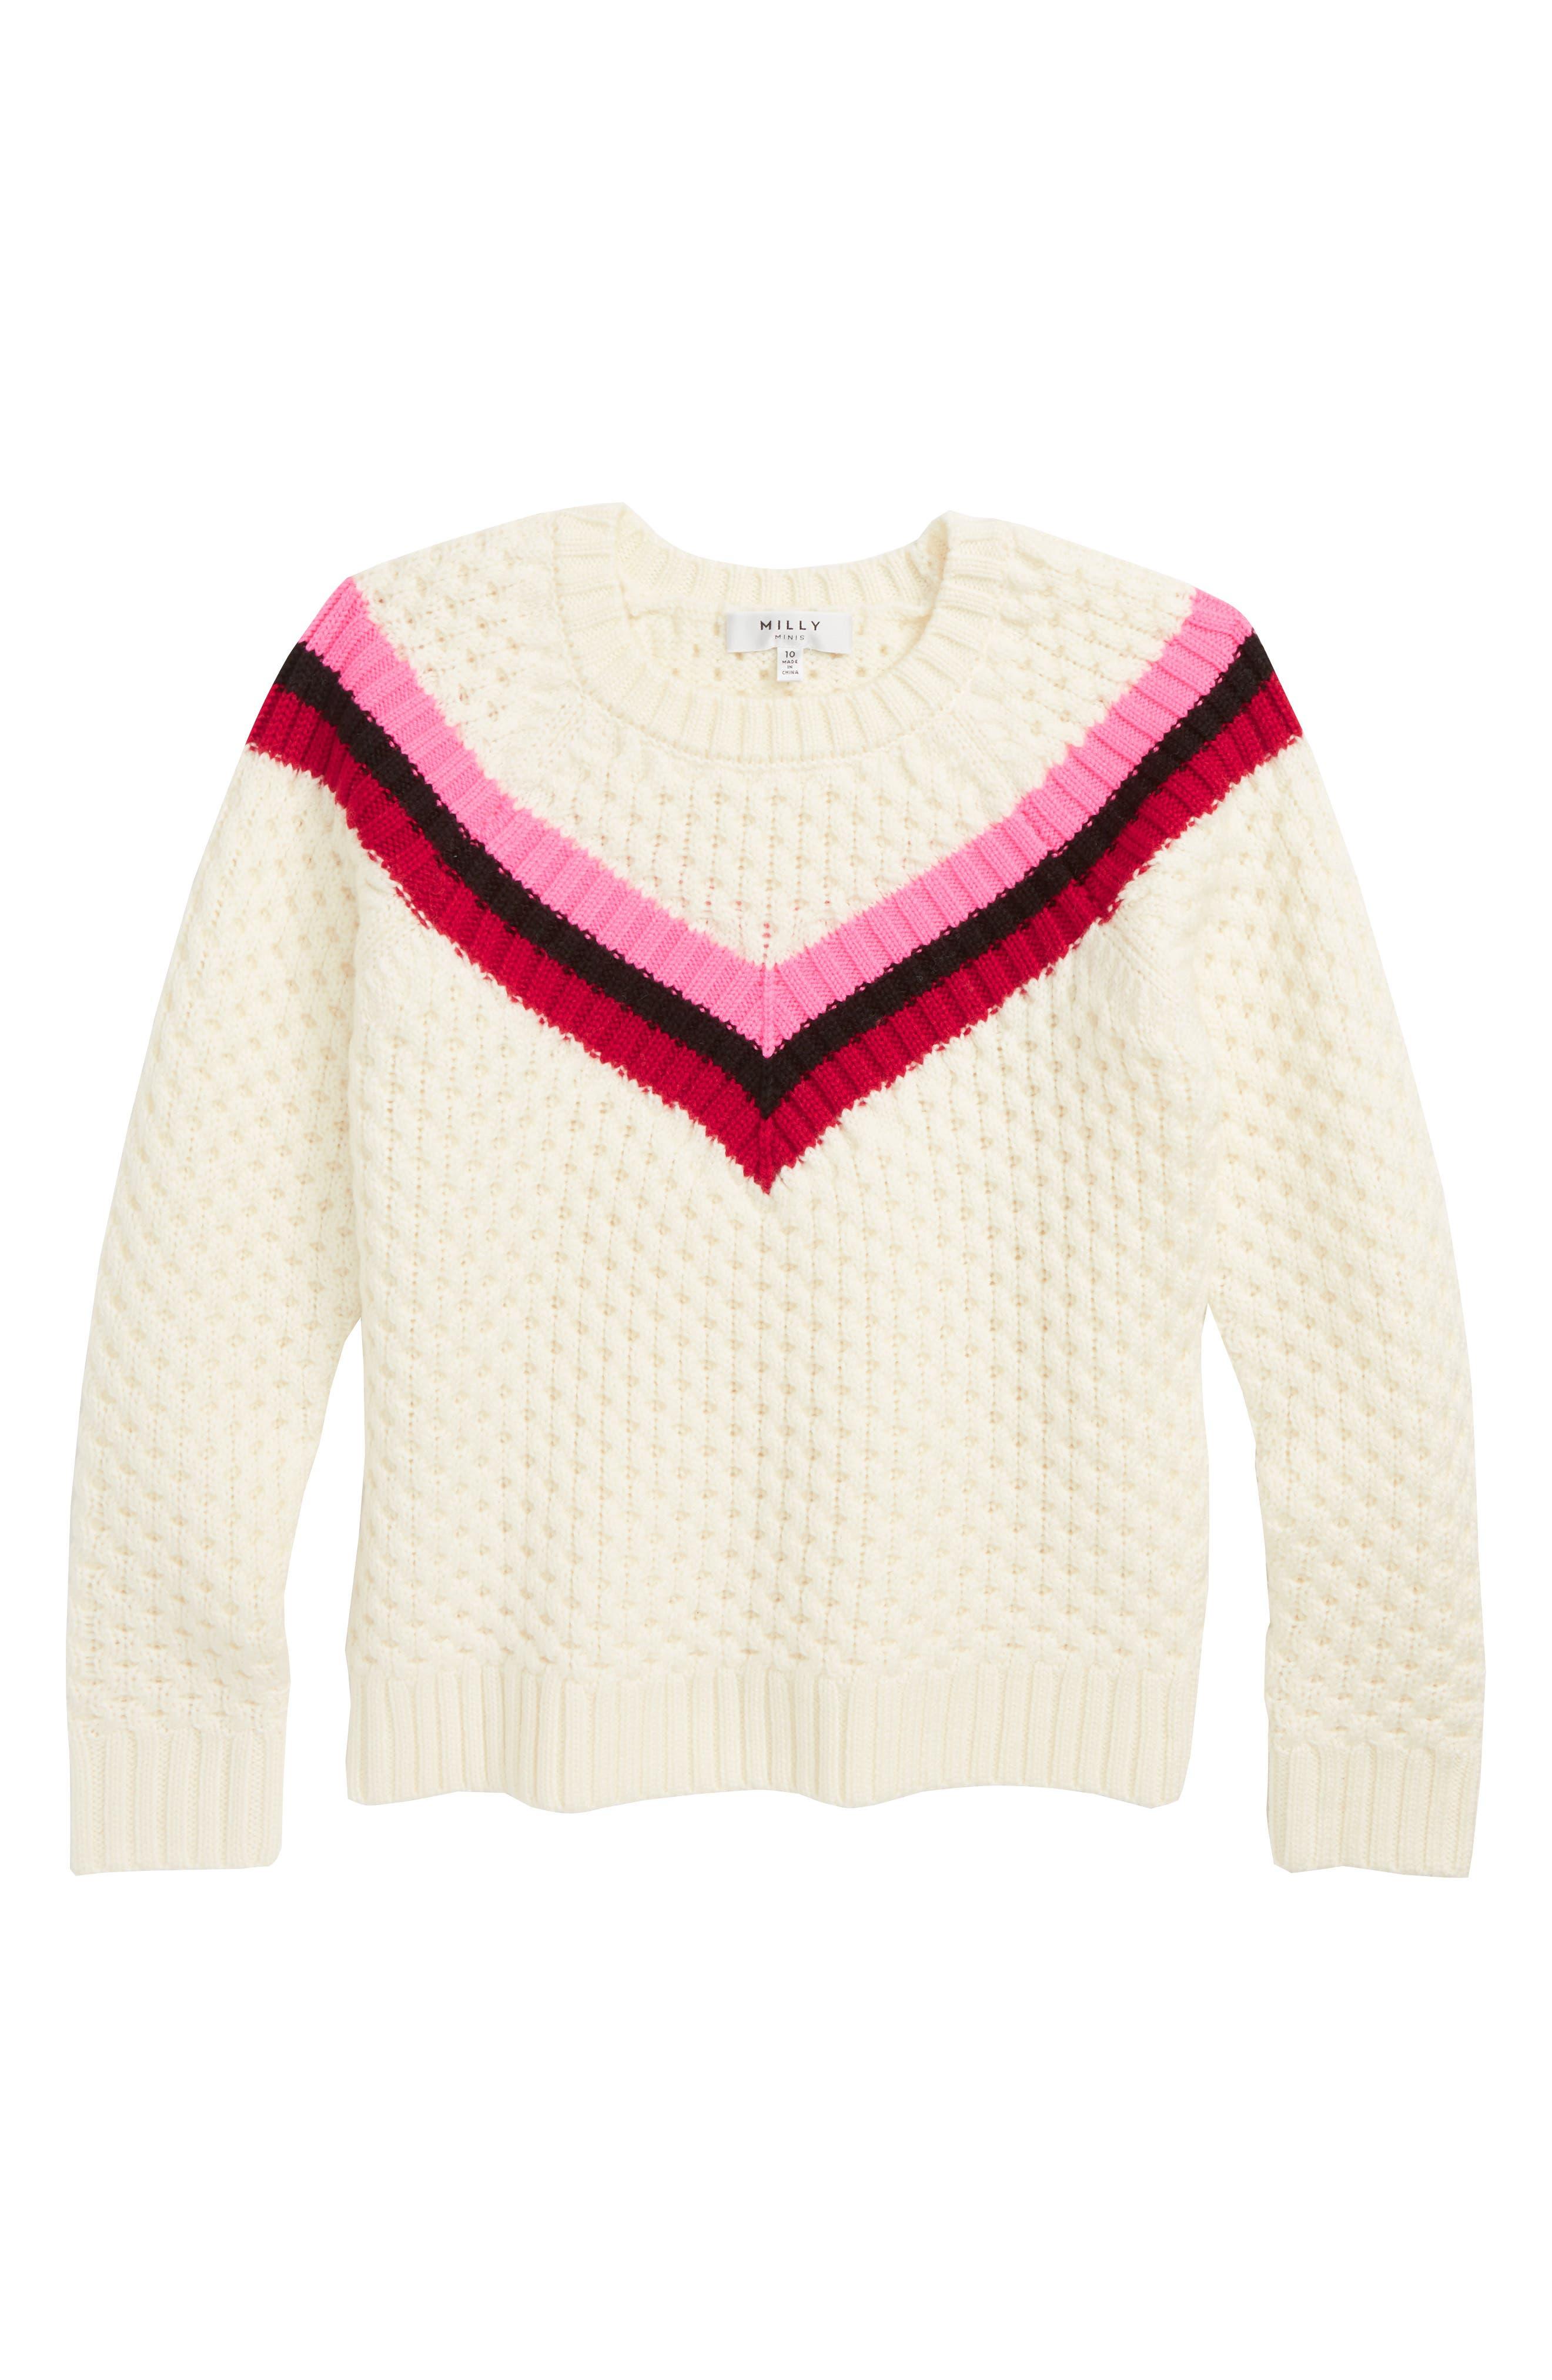 Varsity Stripe Popcorn Stitch Merino Wool Sweater,                             Main thumbnail 1, color,                             WHITE